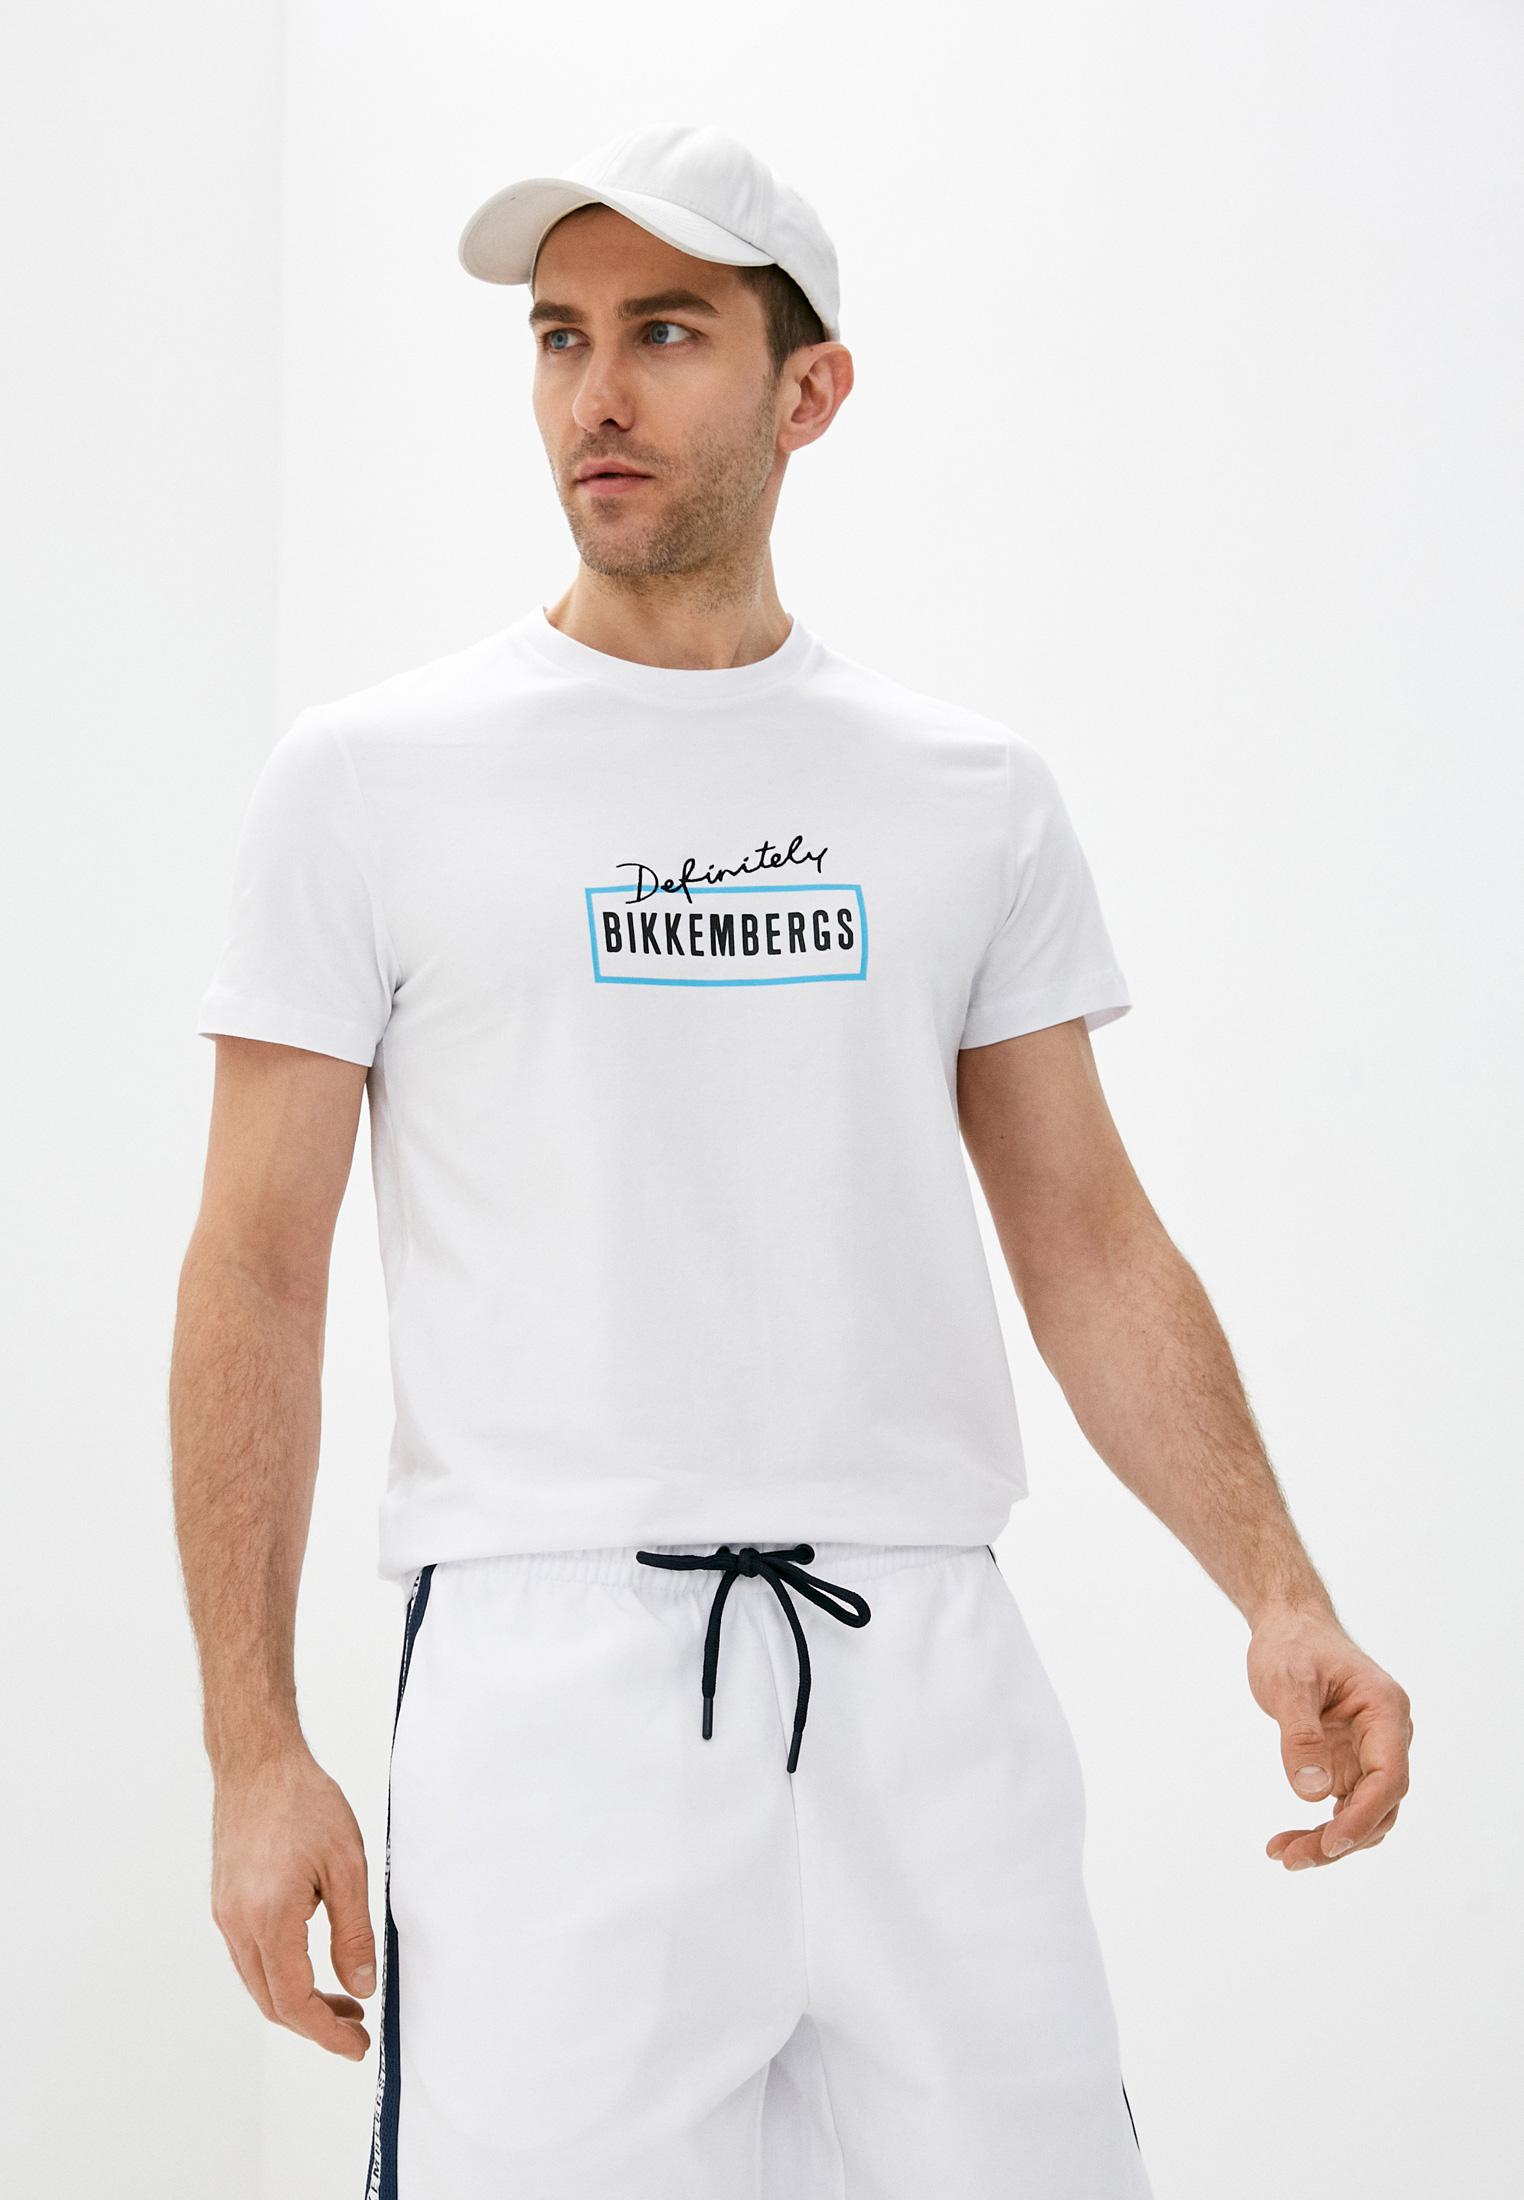 Мужская футболка Bikkembergs (Биккембергс) C 4 101 03 E 2231